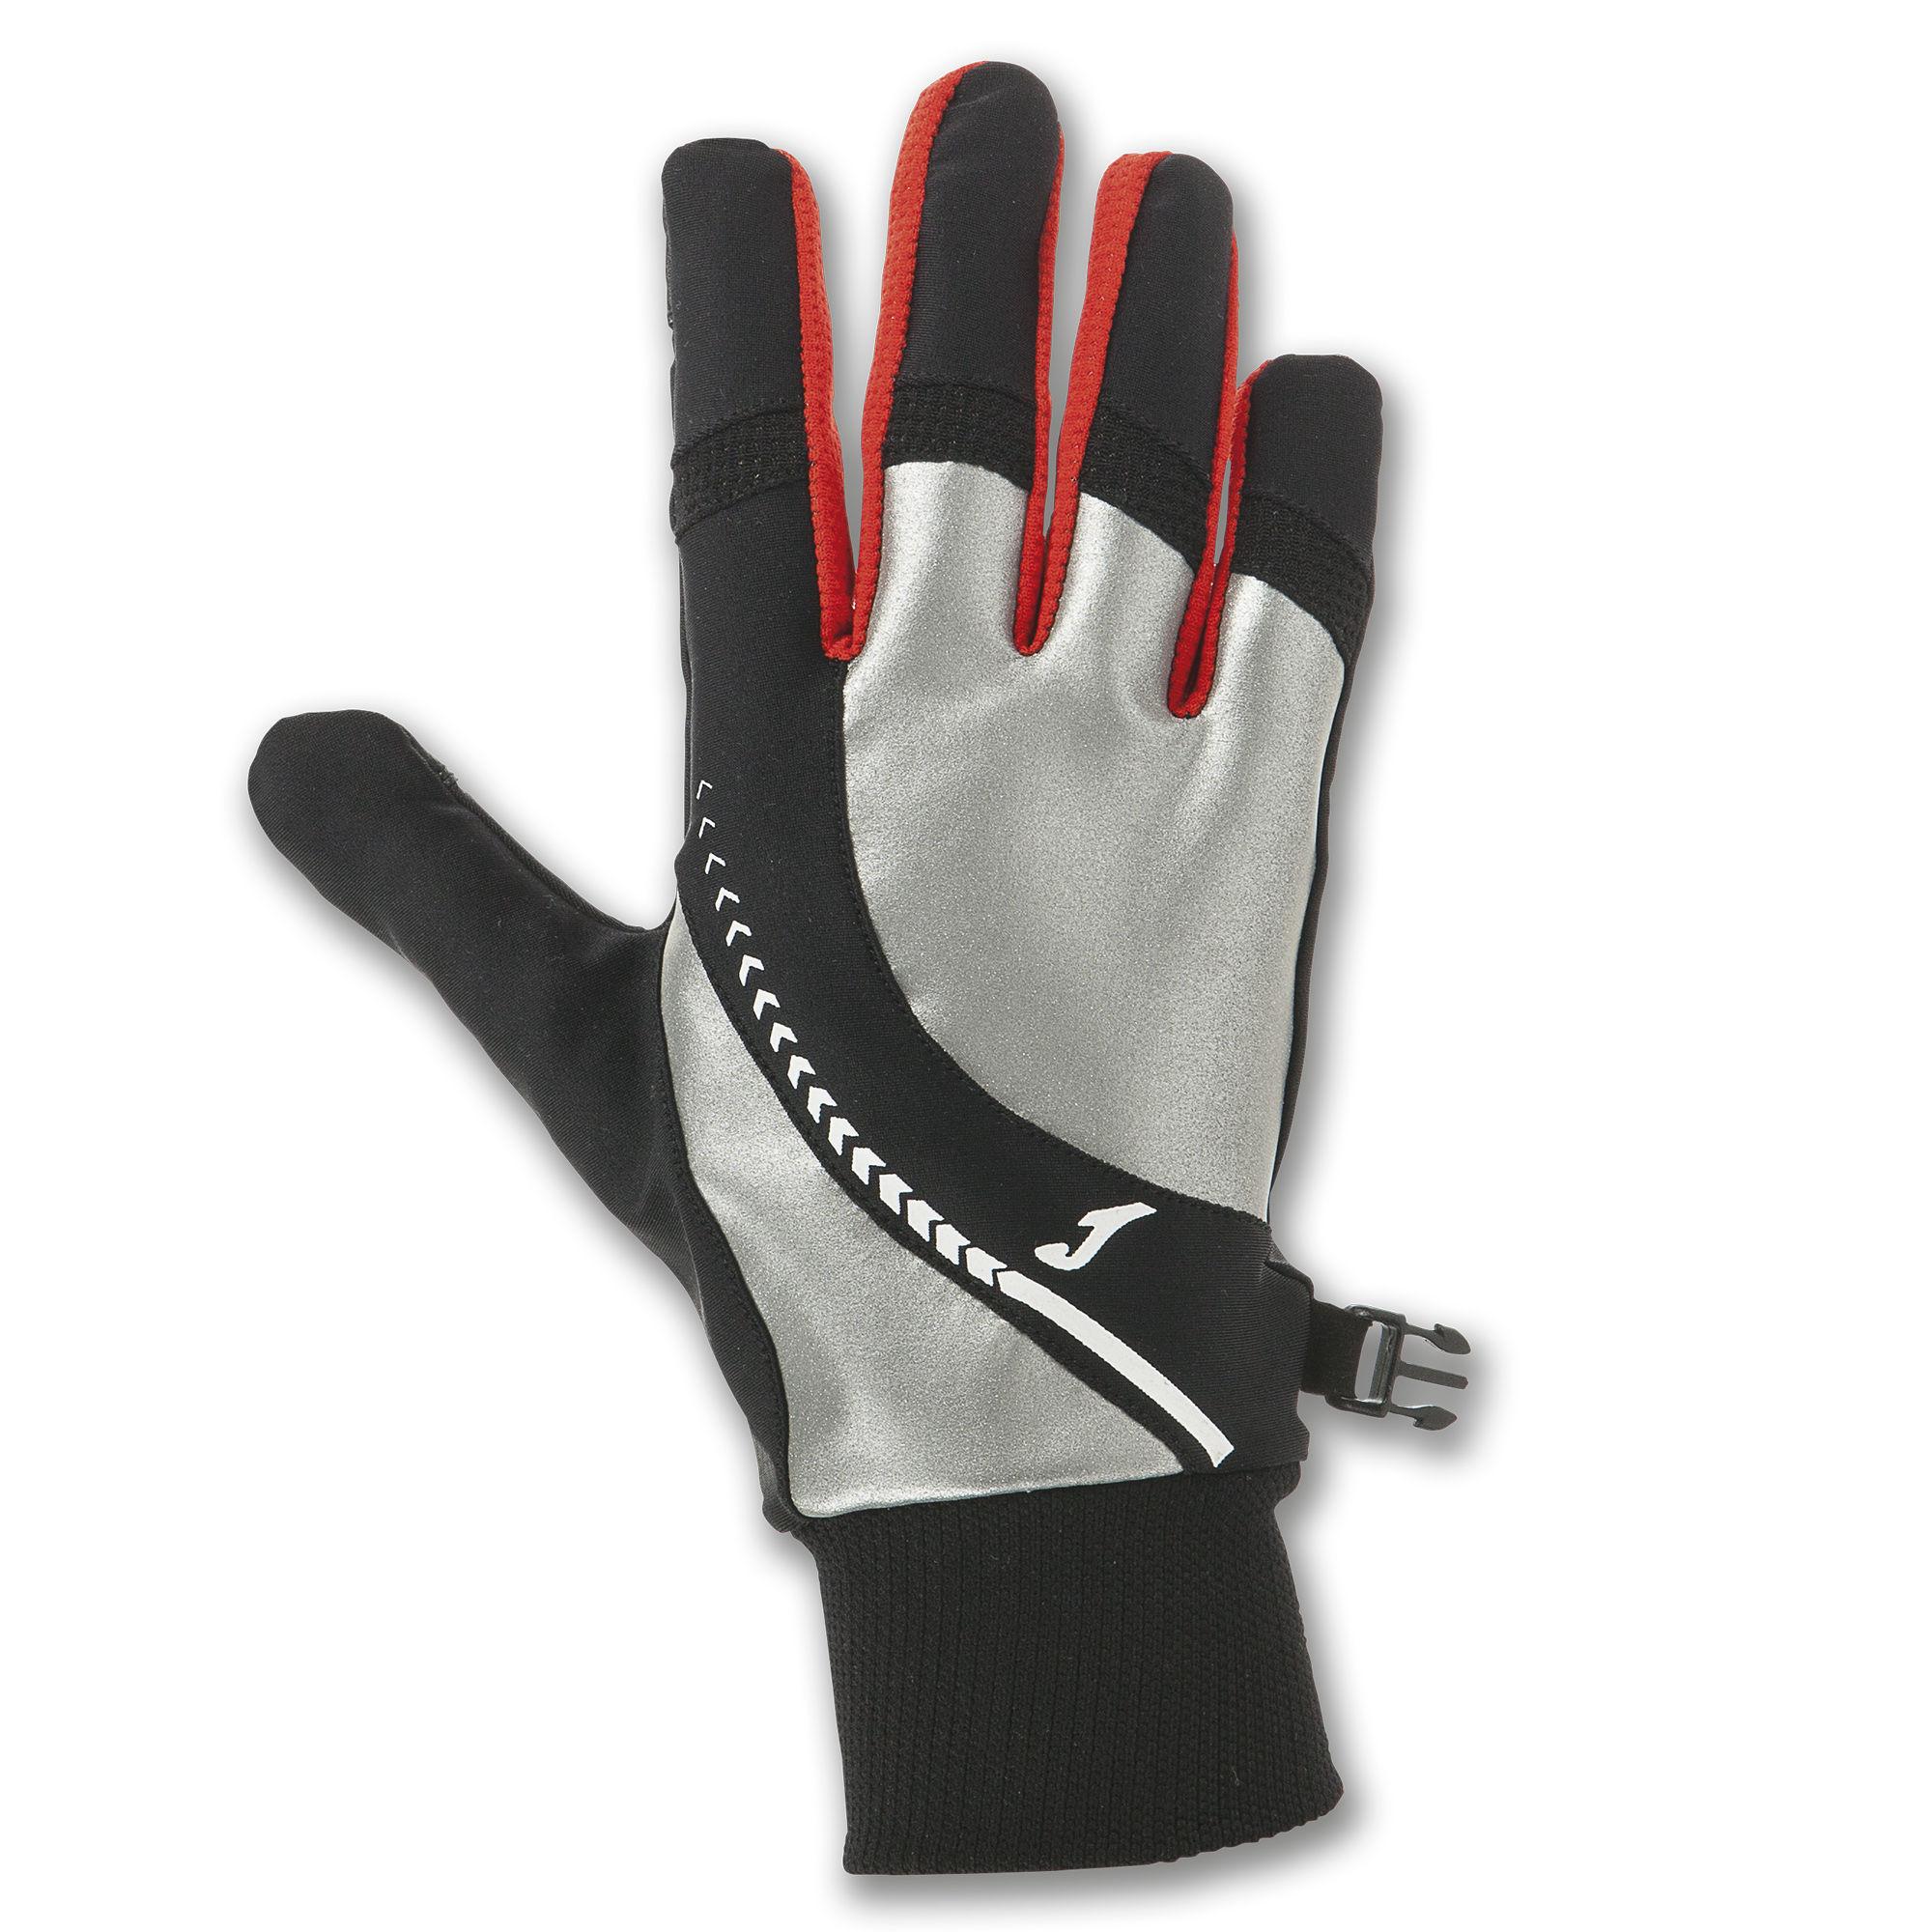 Mănuși de antrenament